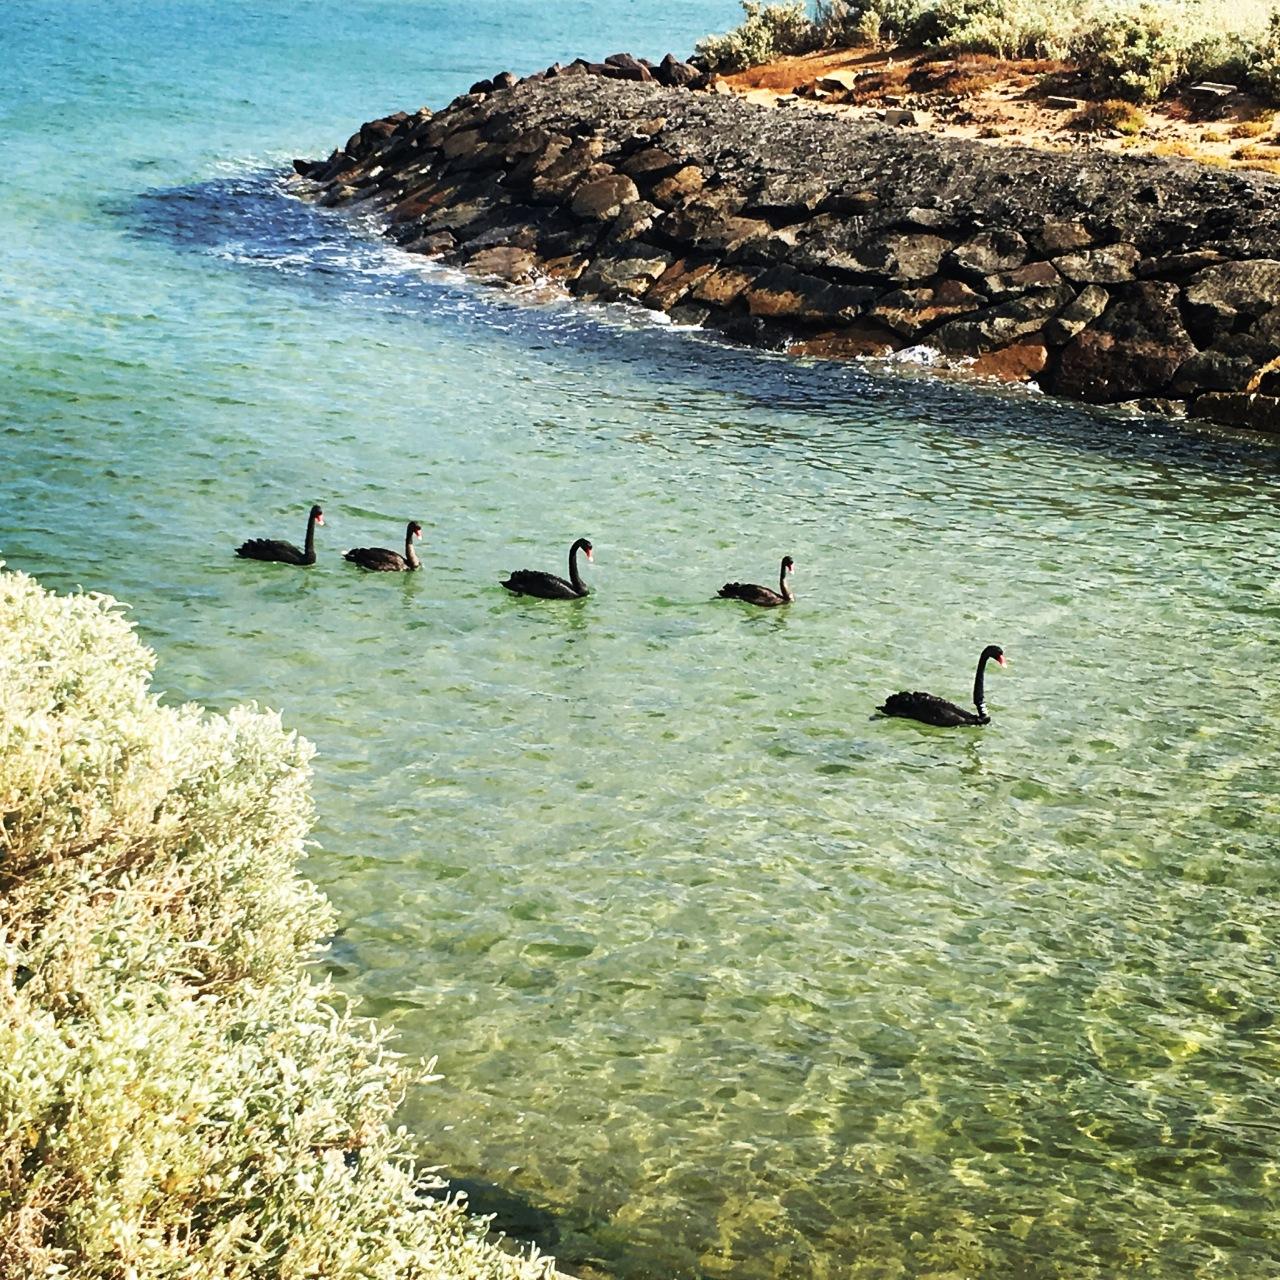 Elwood swans